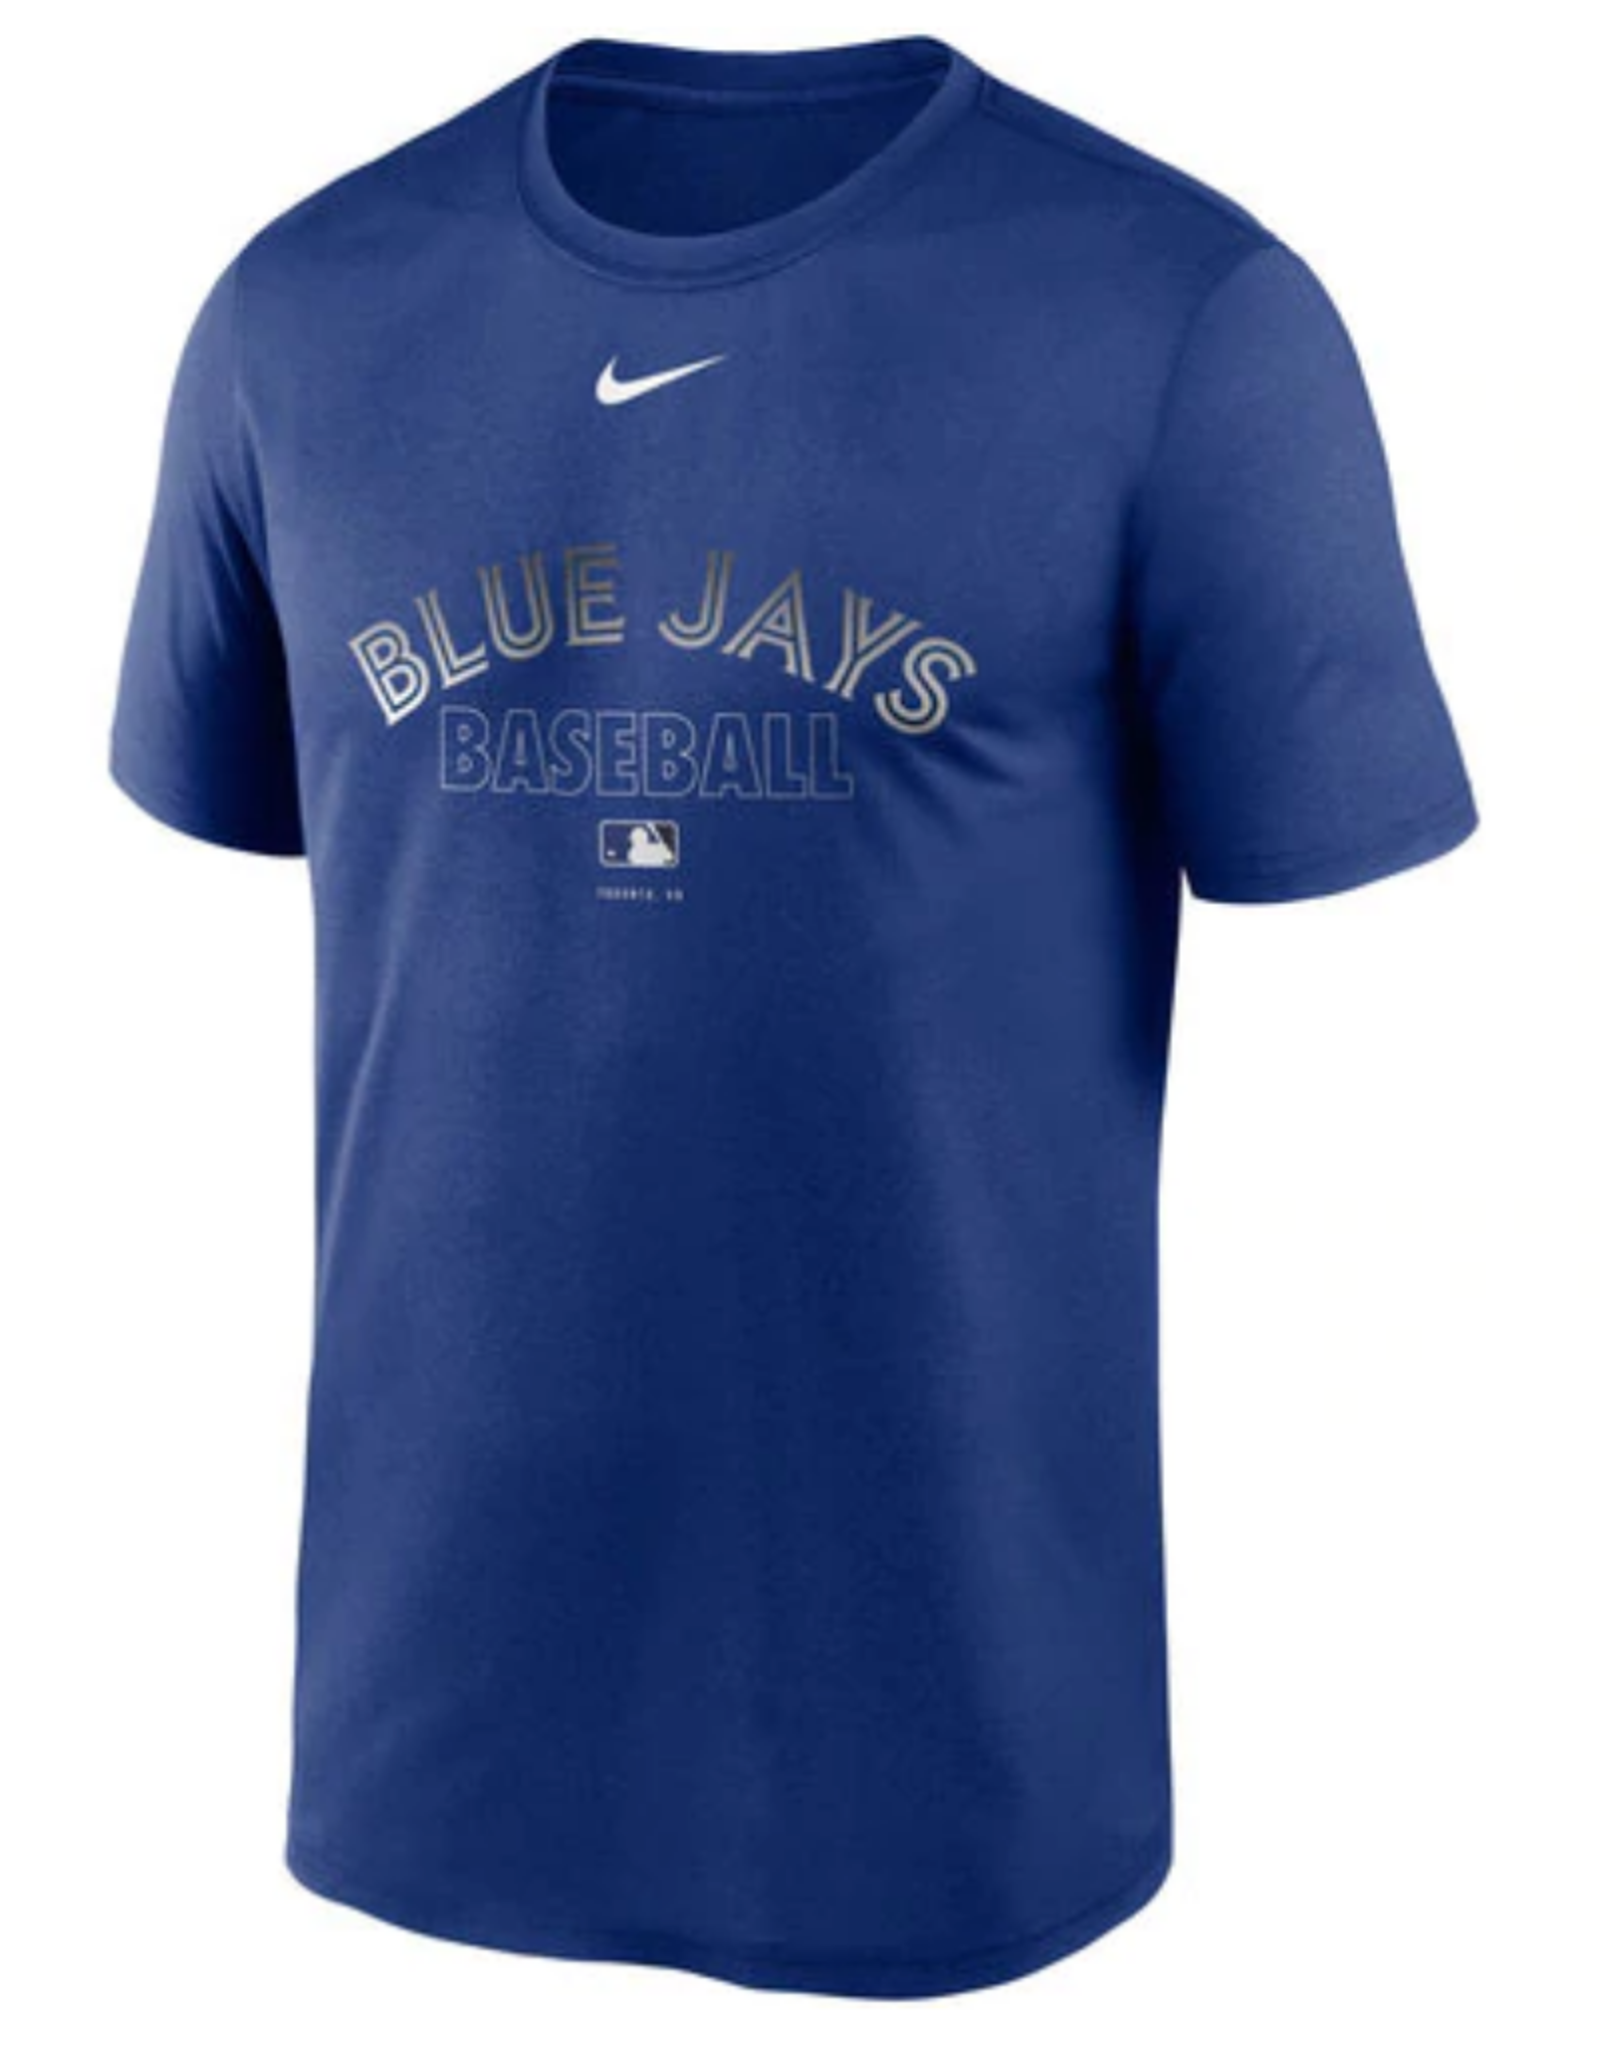 Nike Men's Authentic Collection Legend T-Shirt Toronto Blue Jays Royal